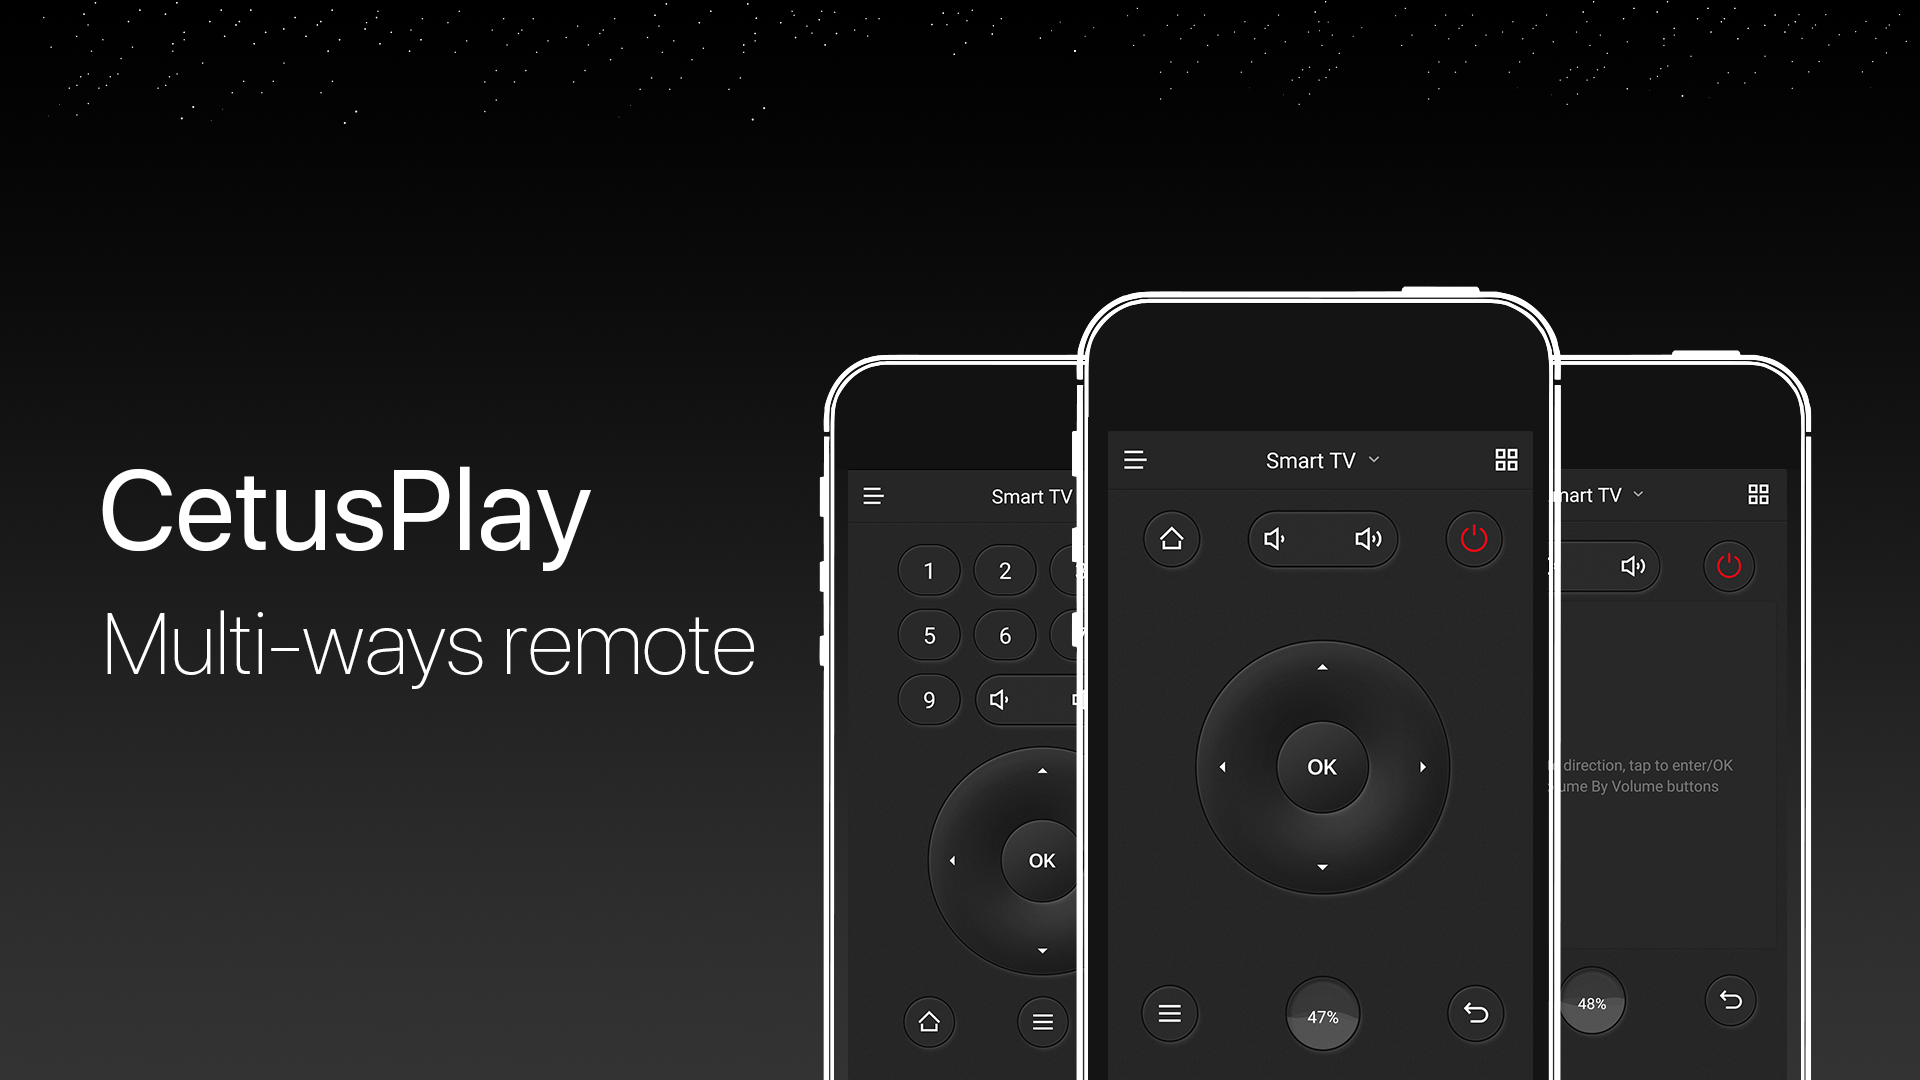 CetusPlay Fire TV/Stick Remote App: Amazon.es: Appstore para Android